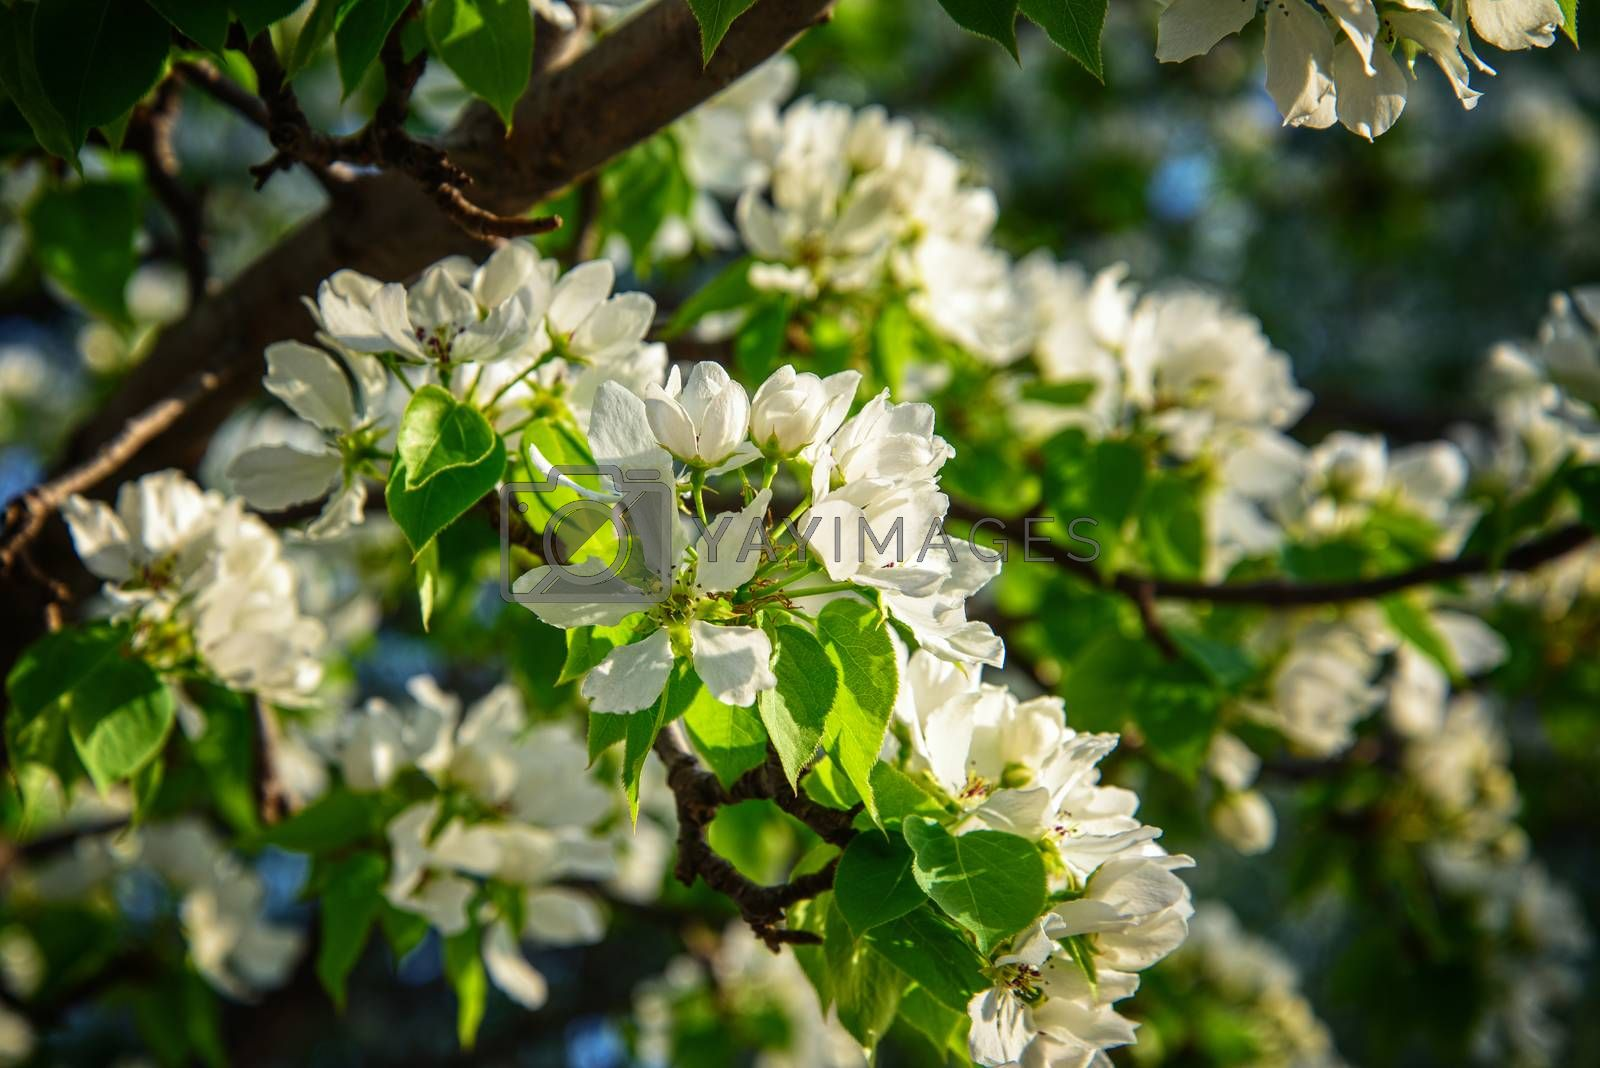 Apple branch with white flowers by VladimirZubkov